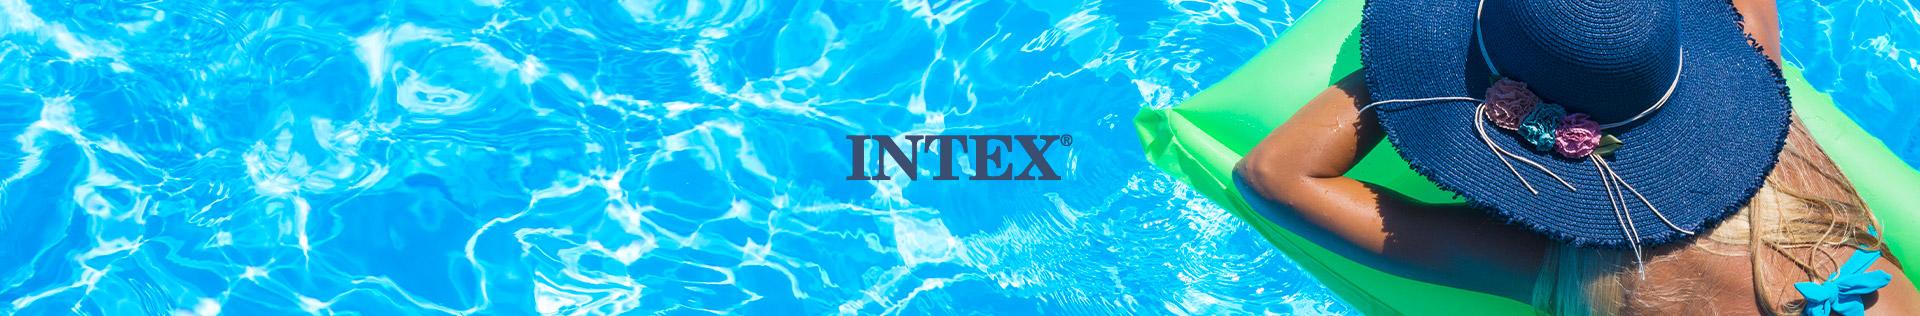 intex banner